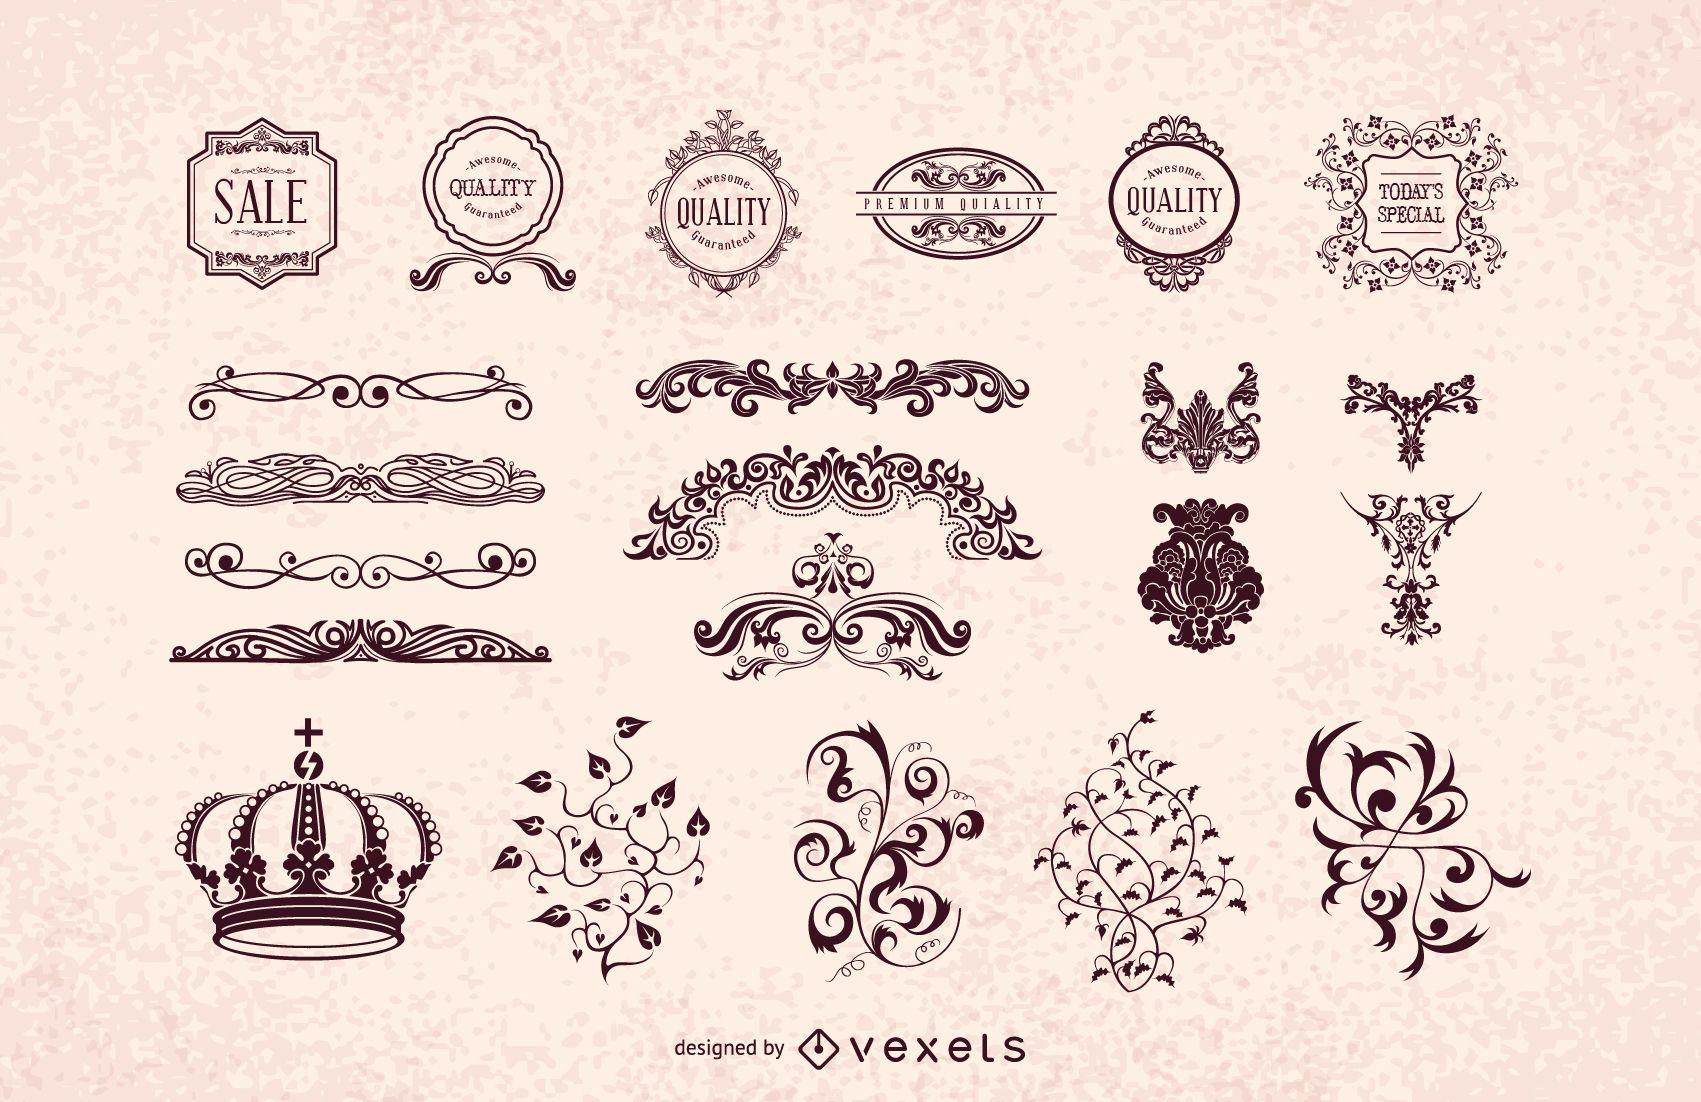 Pacote de enfeites decorativos heráldicos vintage